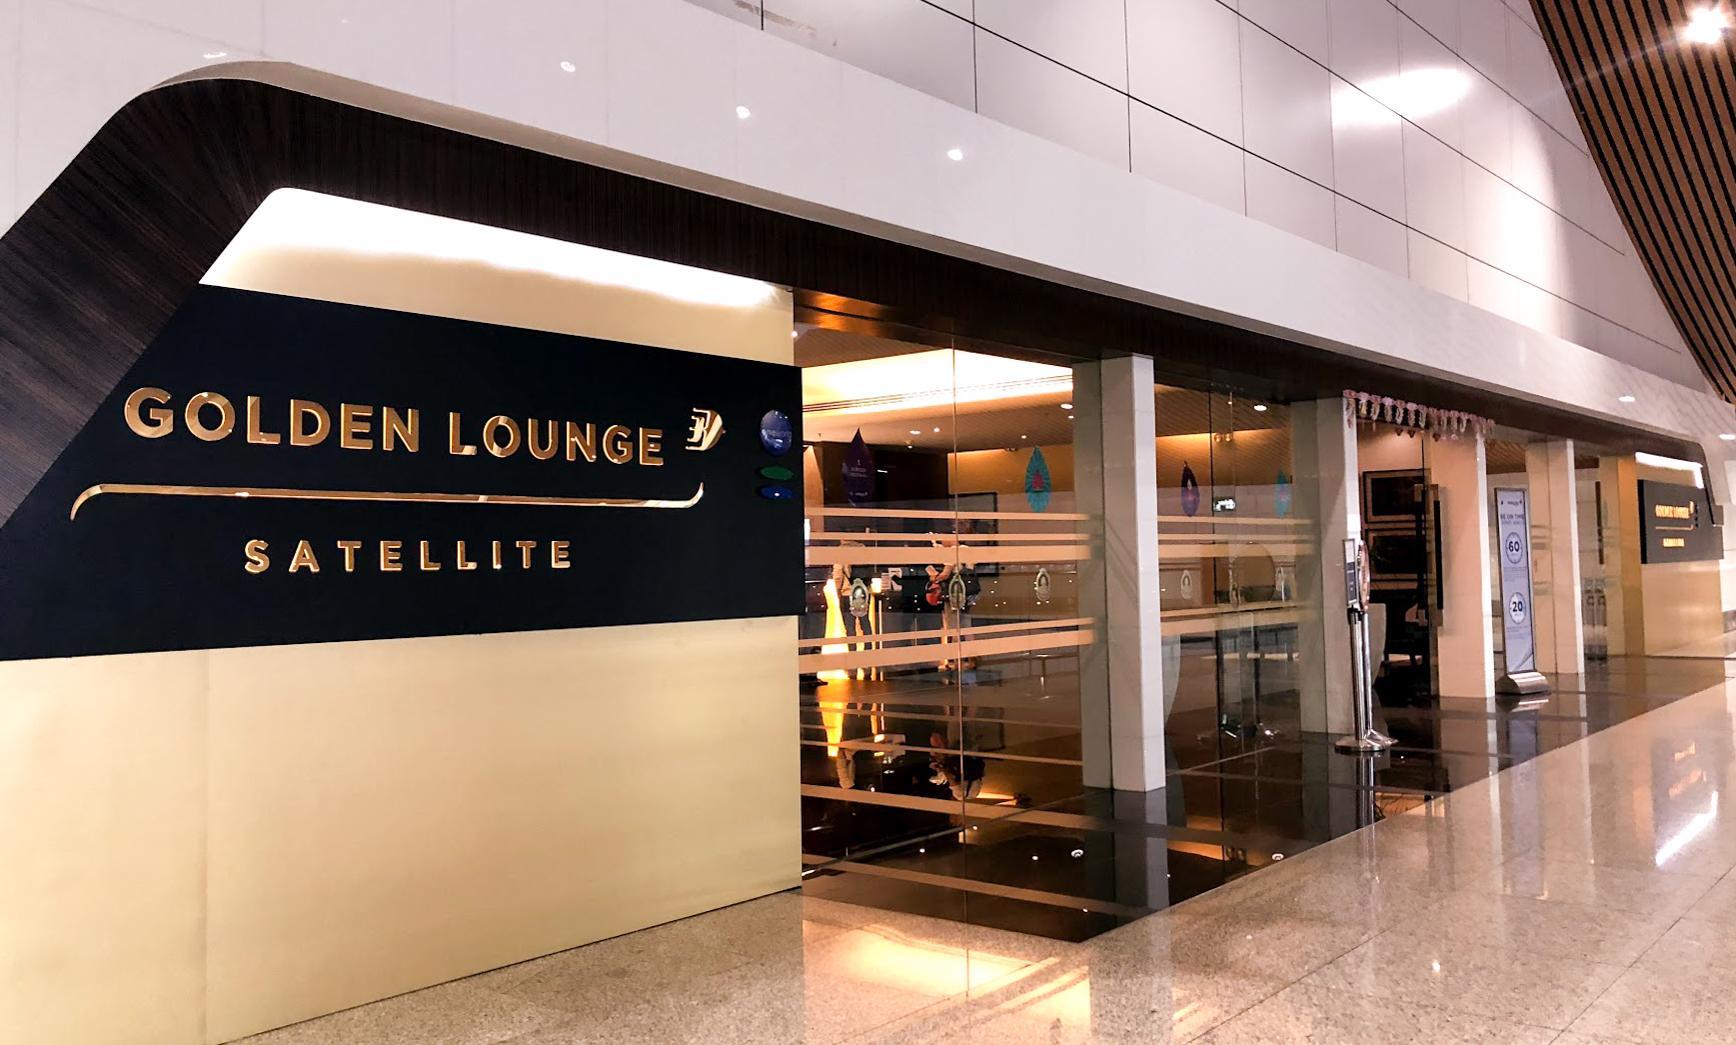 Malaysia Airlines Satellite Golden Lounge Kuala Lumpur entrance